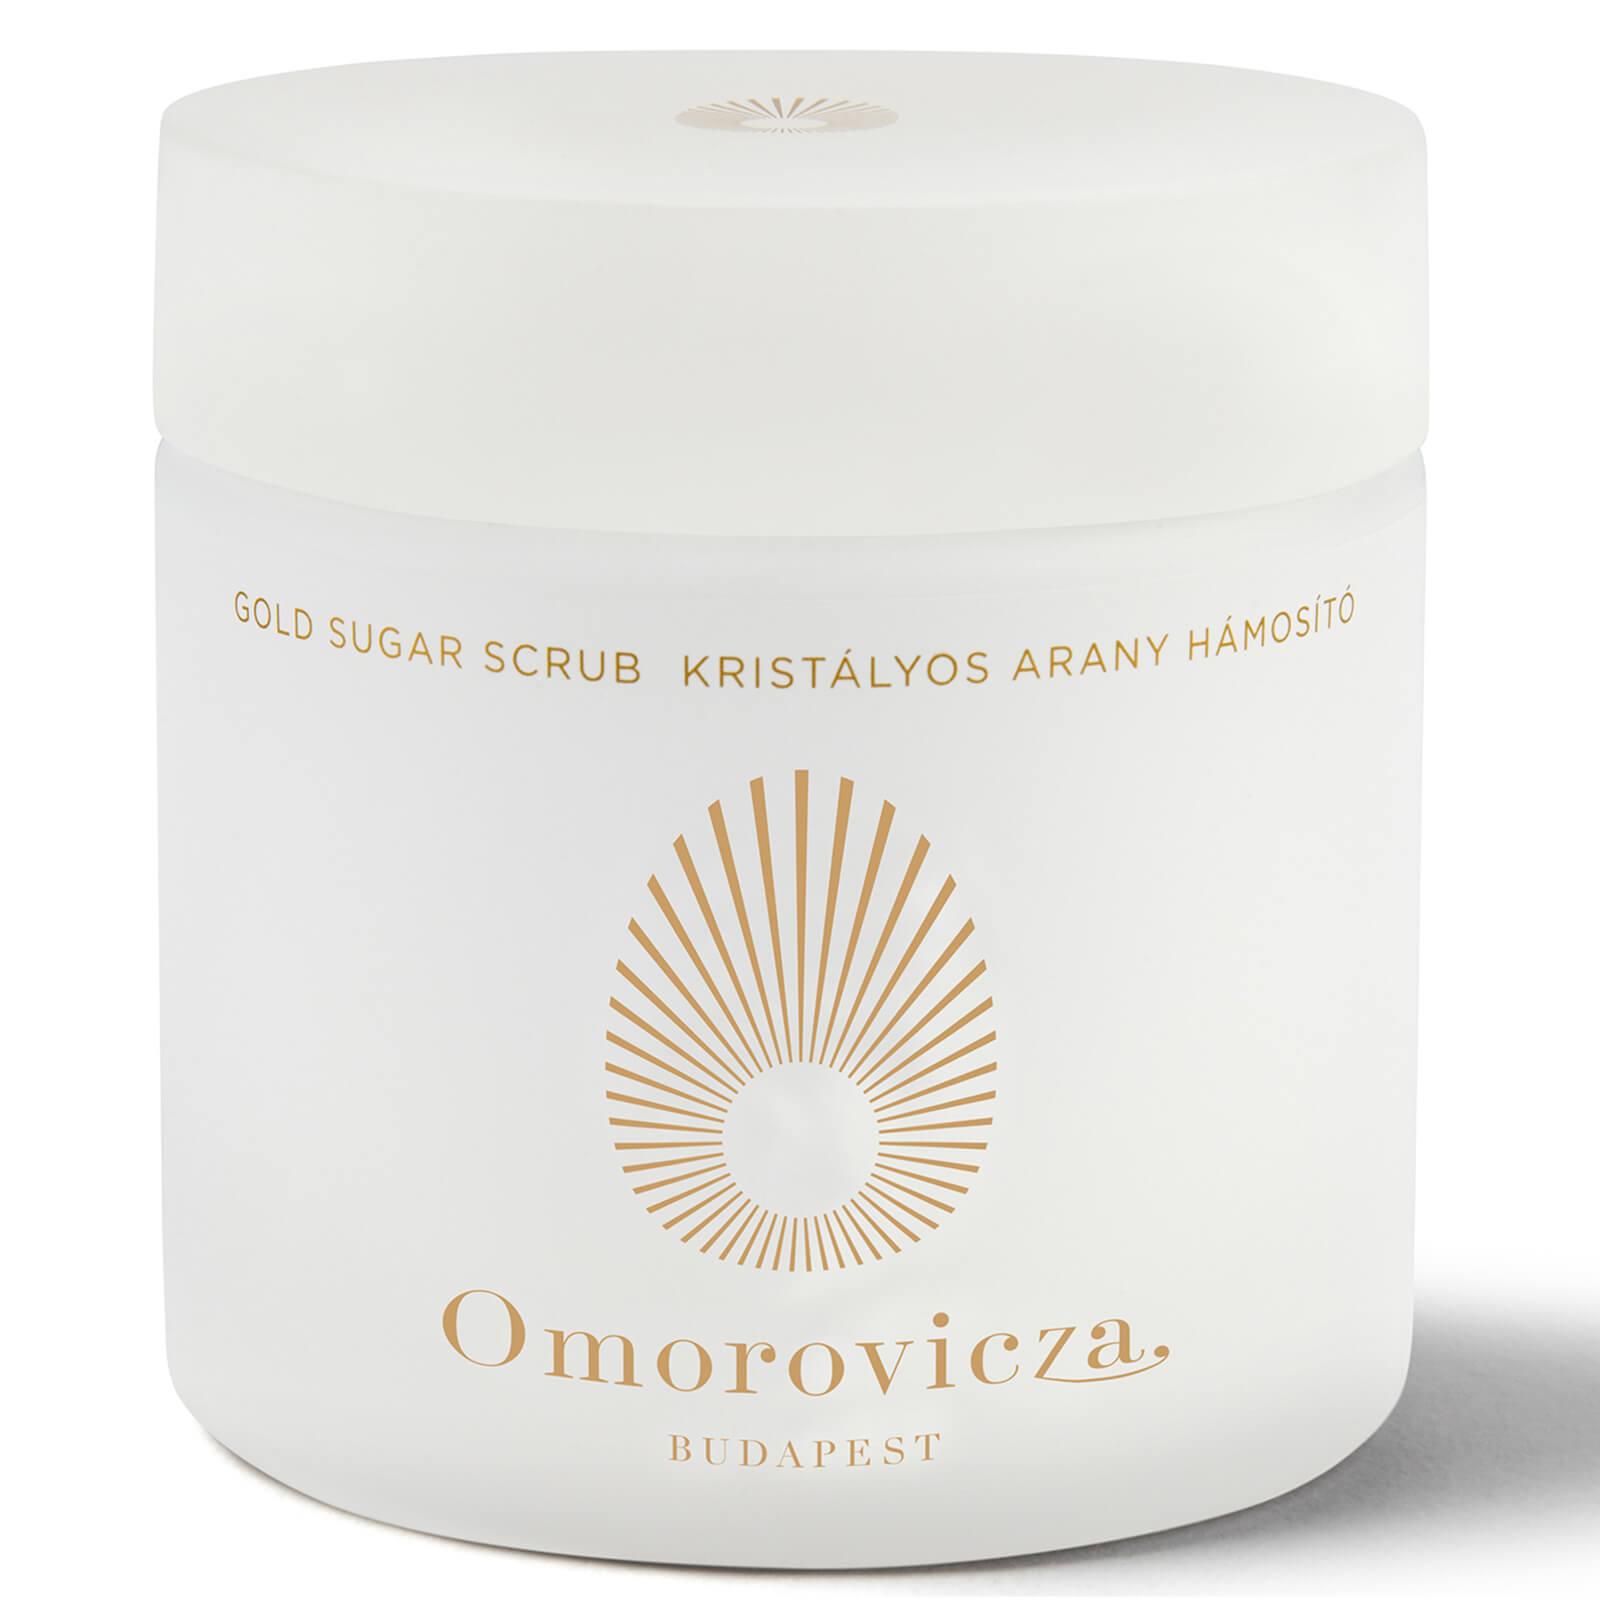 Omorovicza Gold Sugar Scrub 200ml Beautyexpert Marina Body Product Description